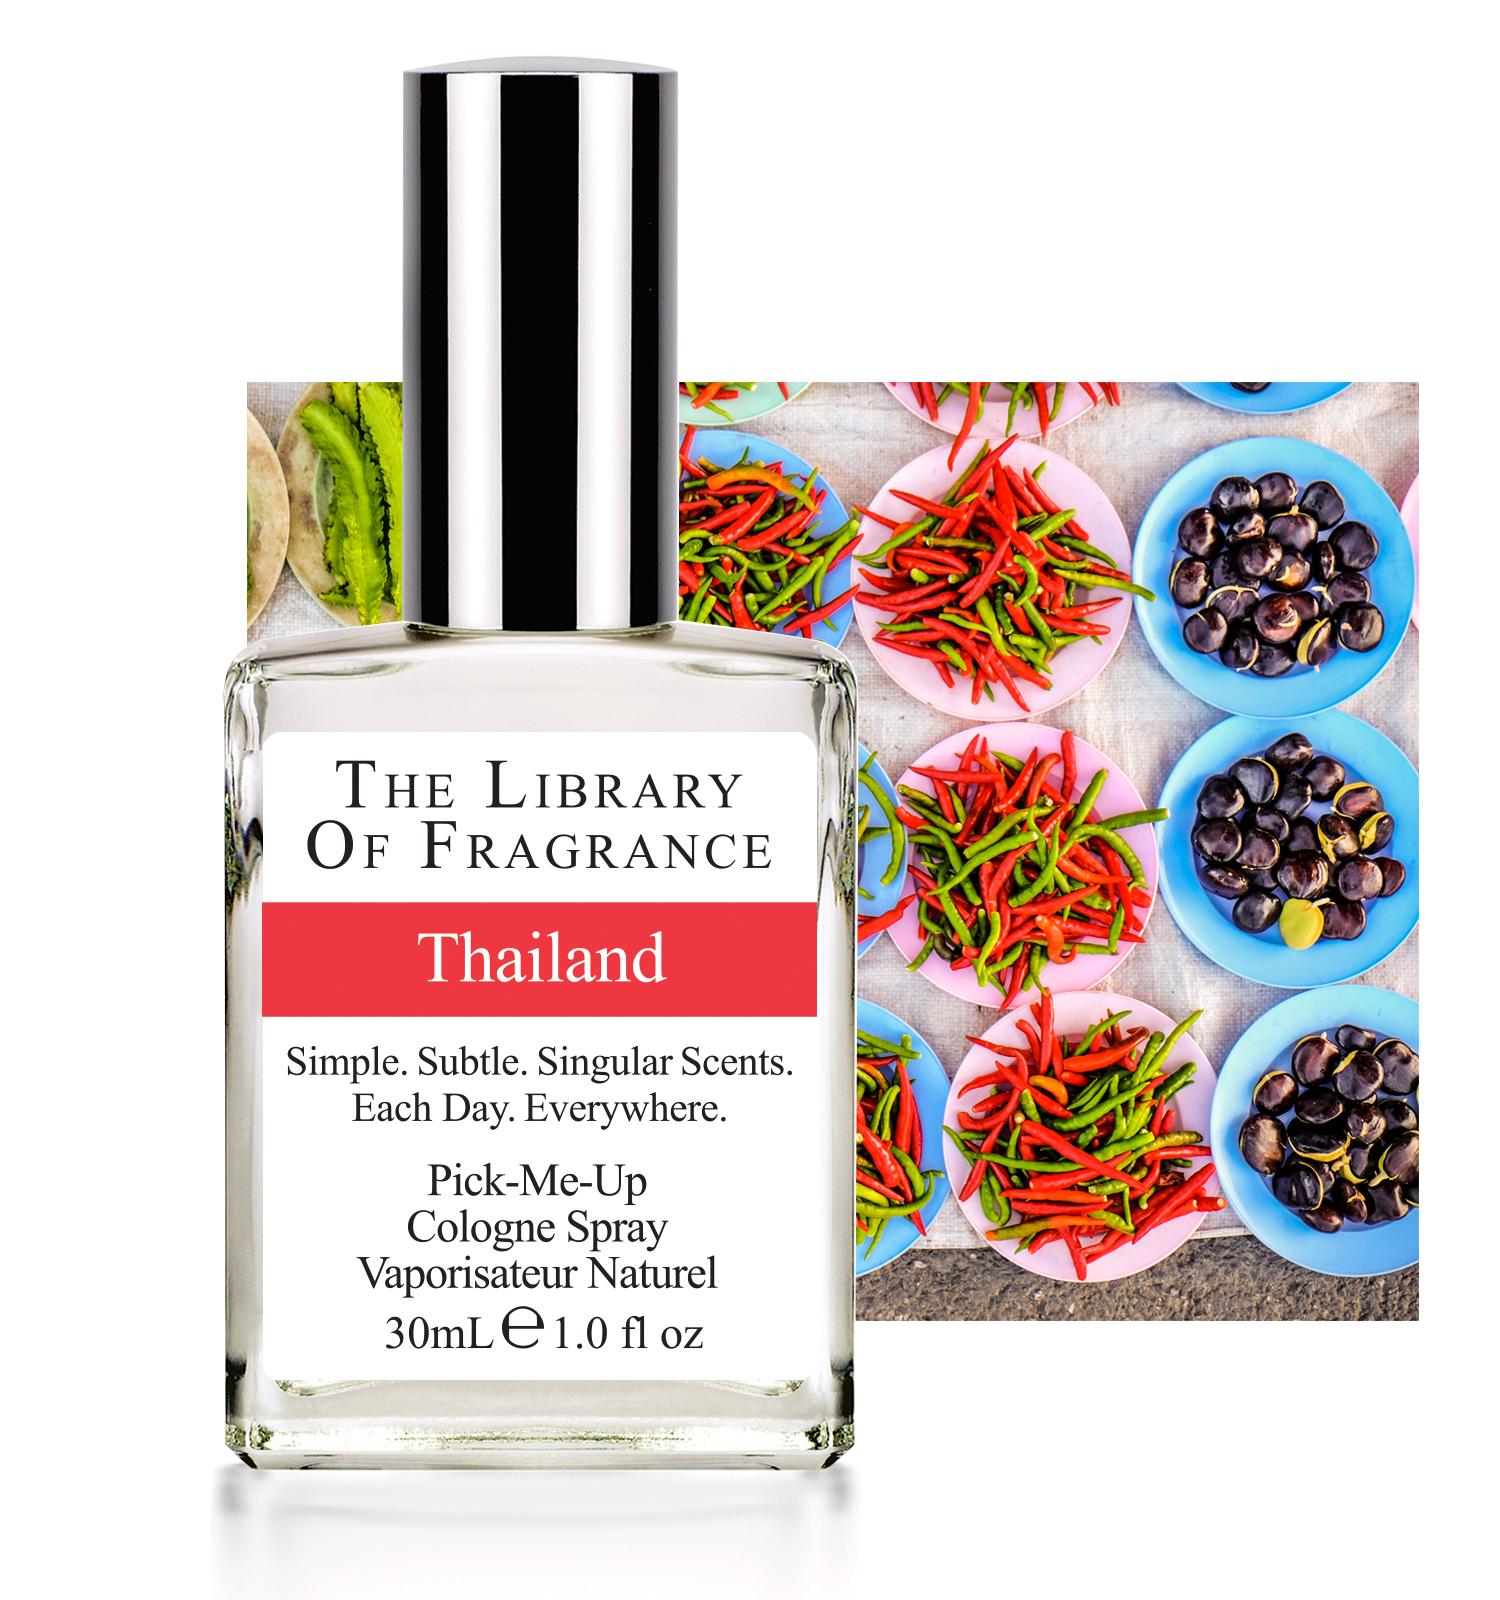 THAILAND_LOF_GRAPHIC.jpg